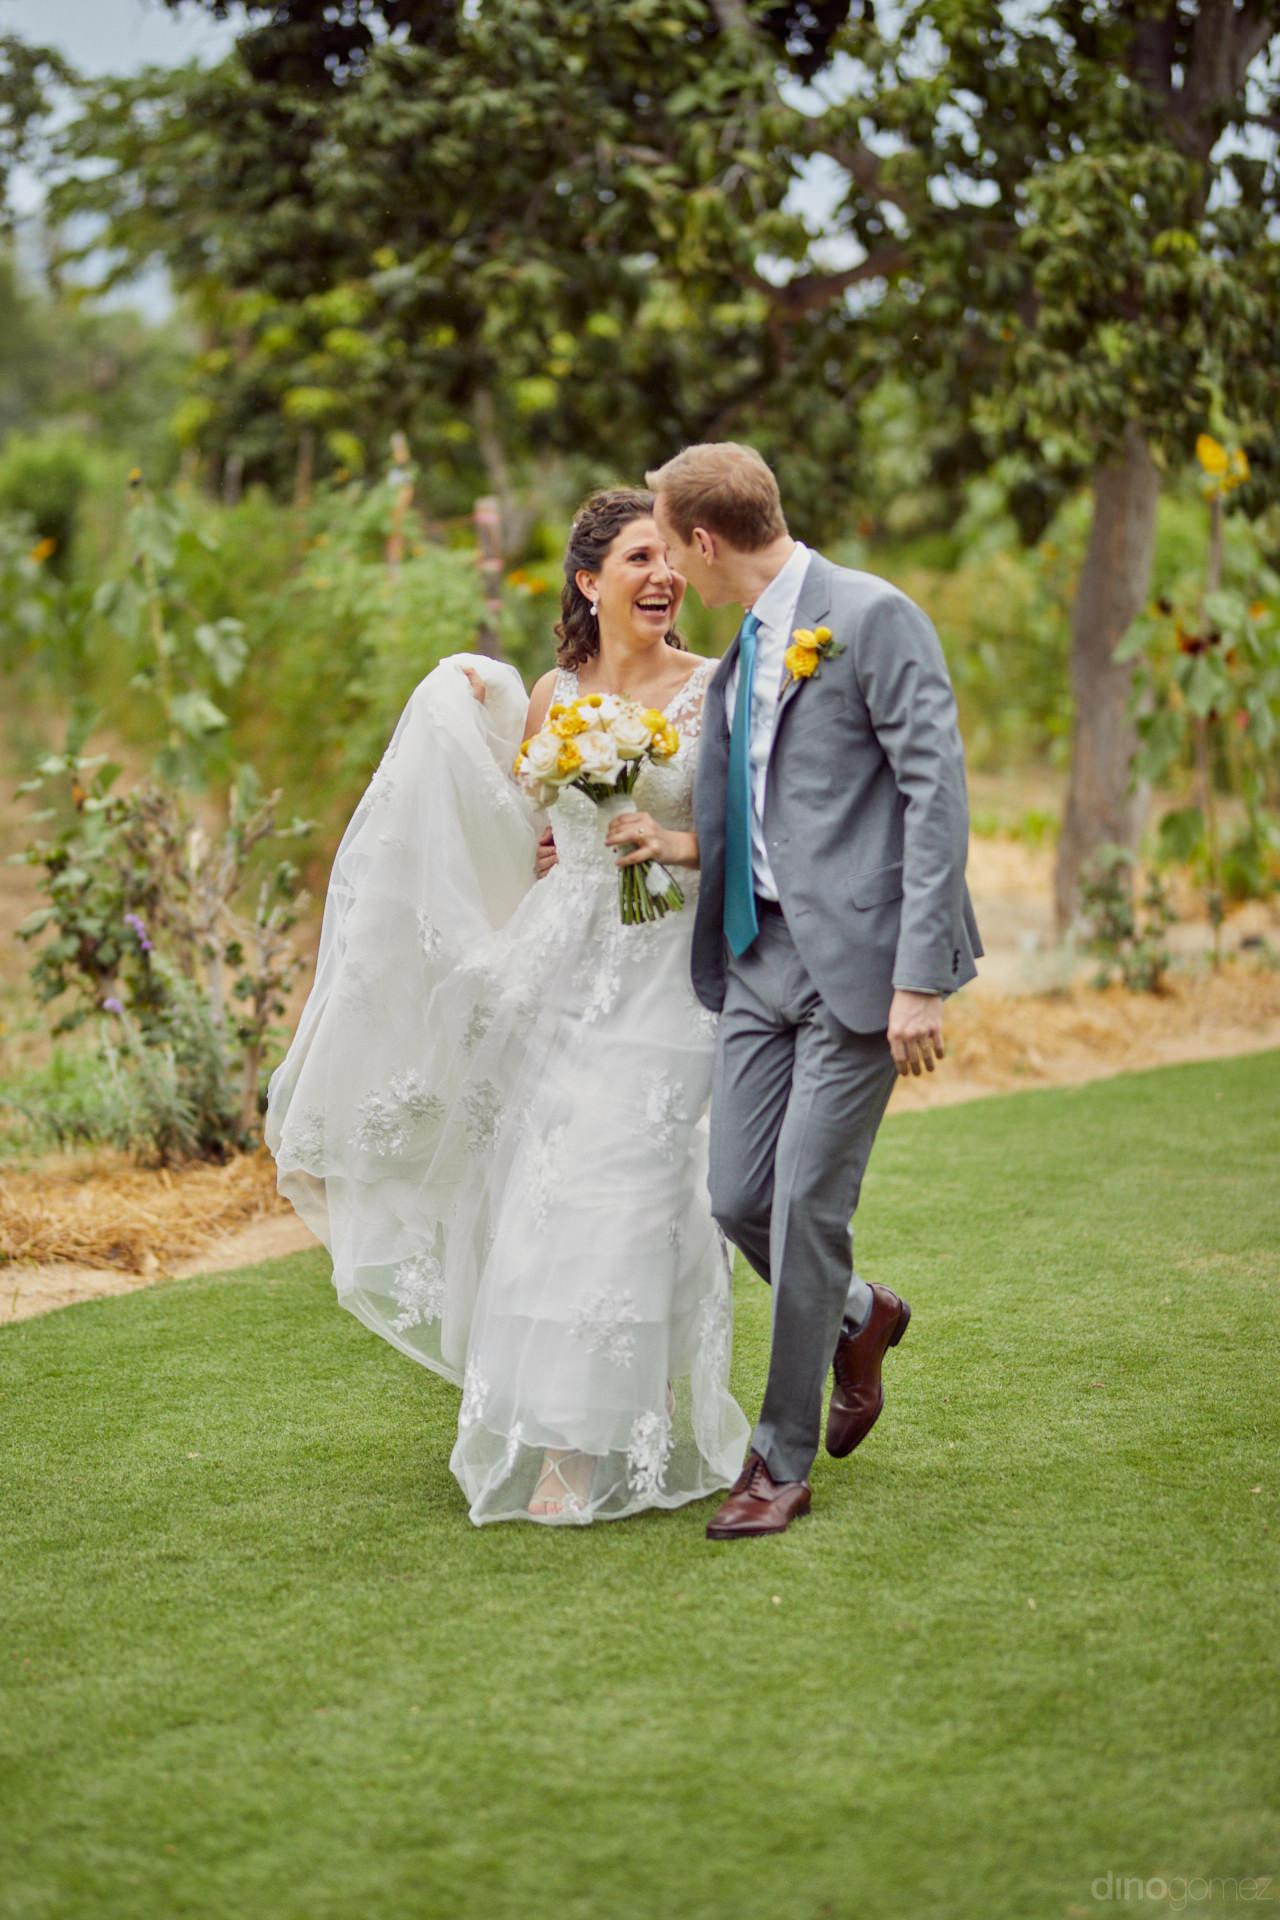 San Jose Del Cabo Destination Weddings - Hilary & Bryan Flora Wedding